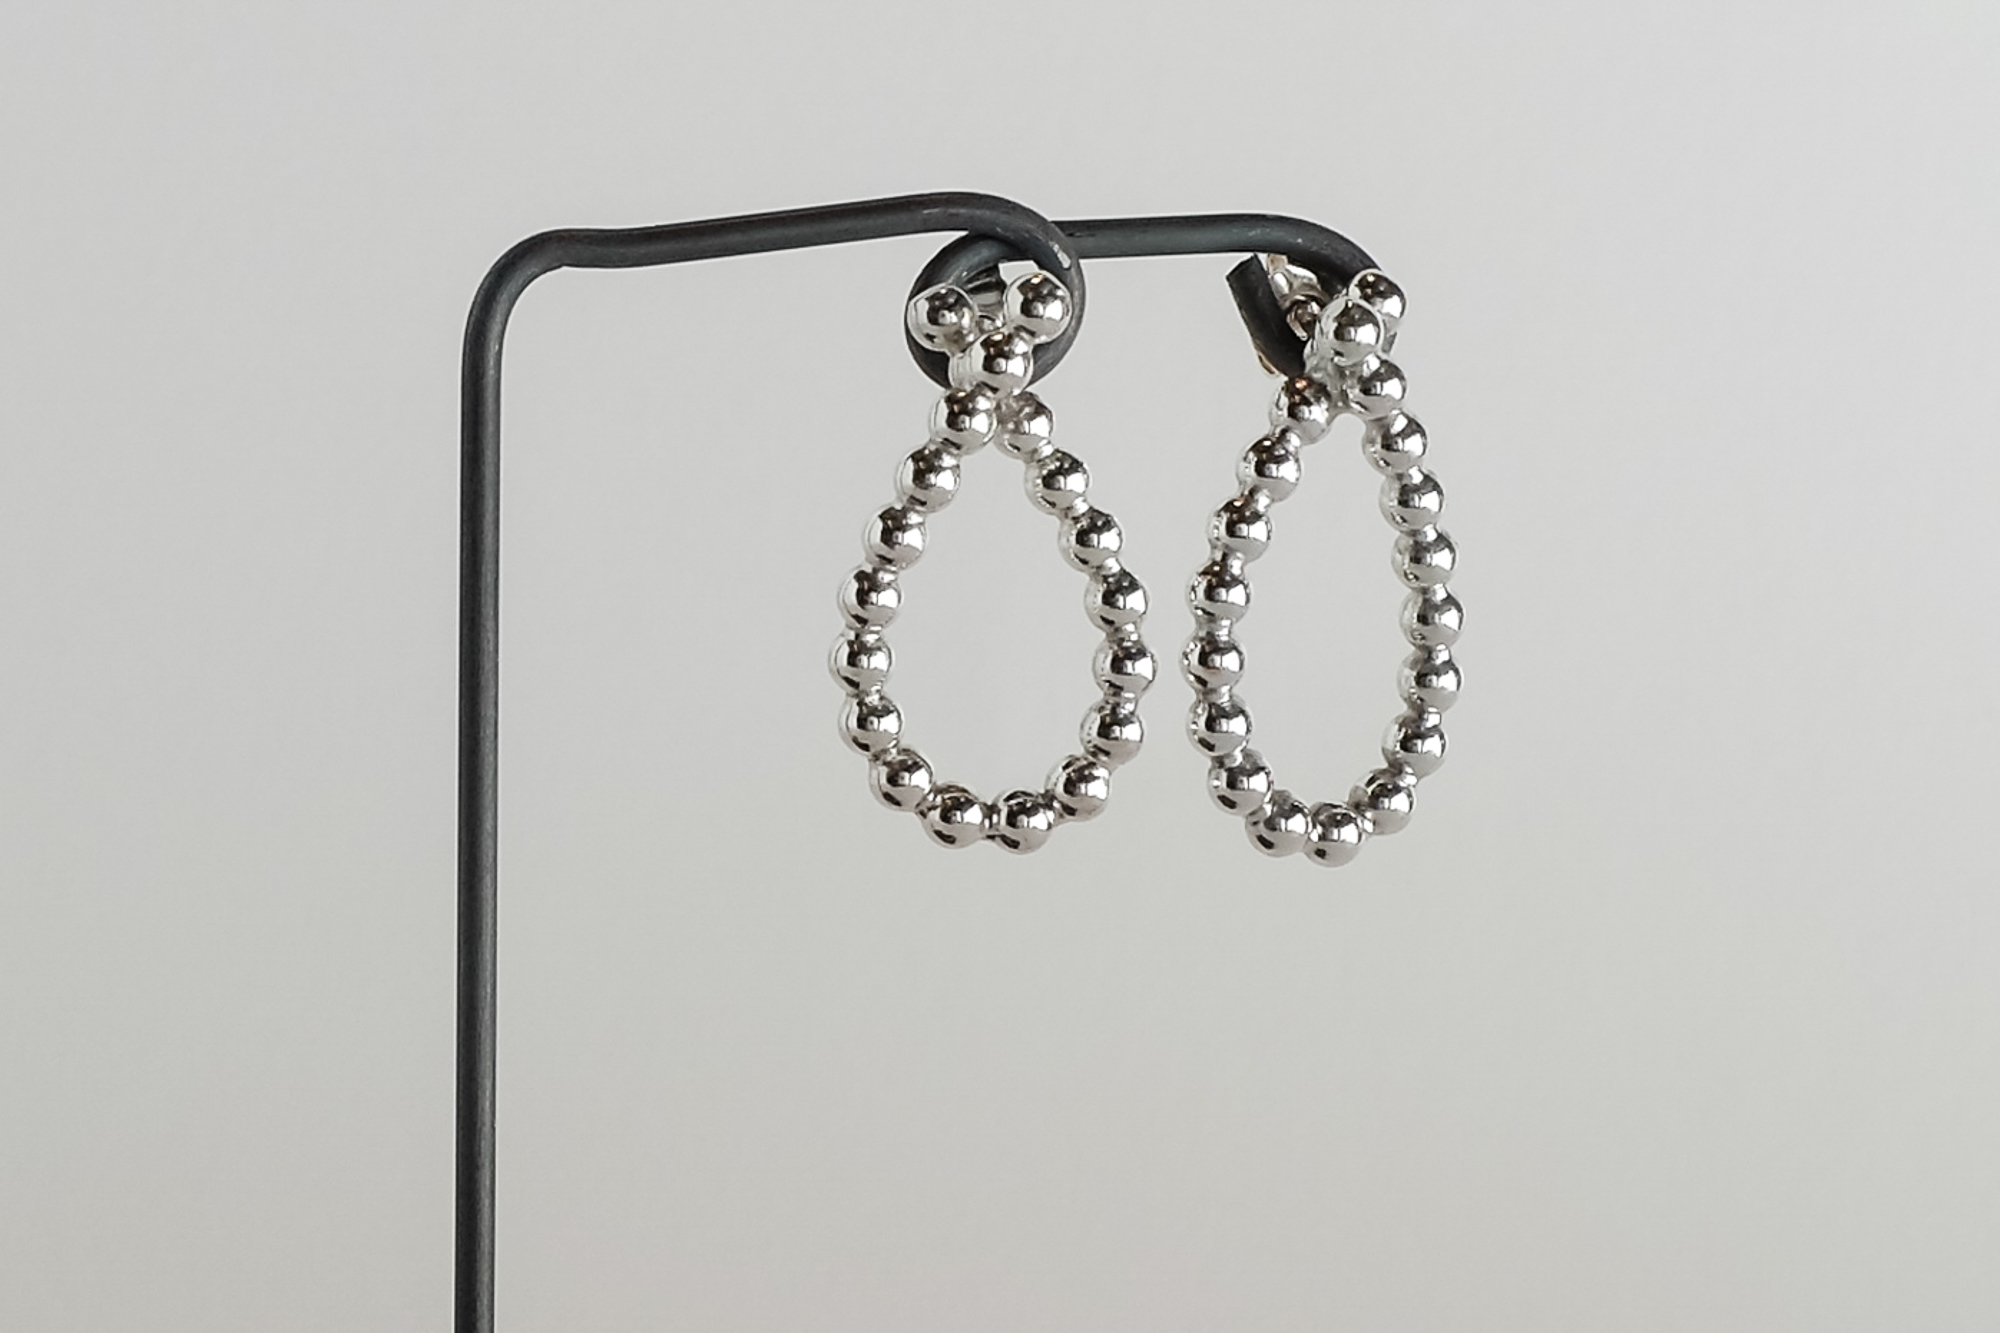 Pris dkk 575. Sølvøreringe i perletråd